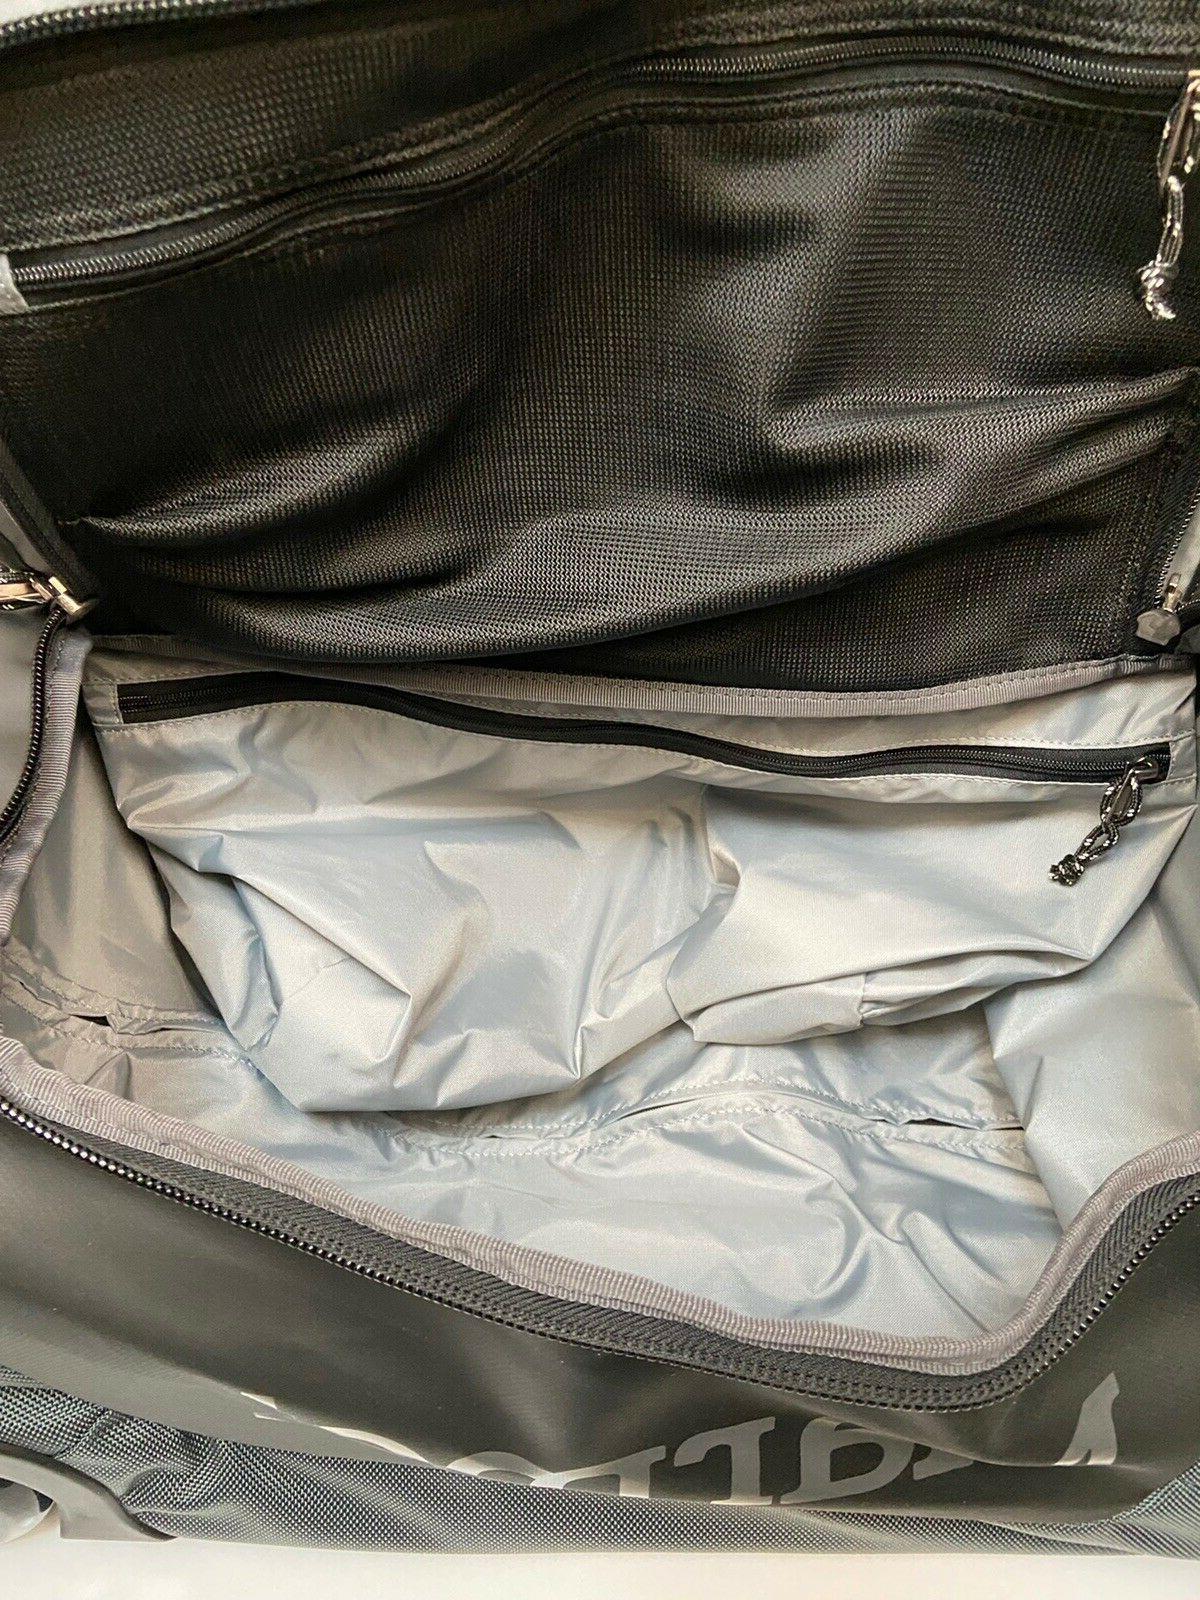 MARMOT Hauler On Bag Suitcase 40L